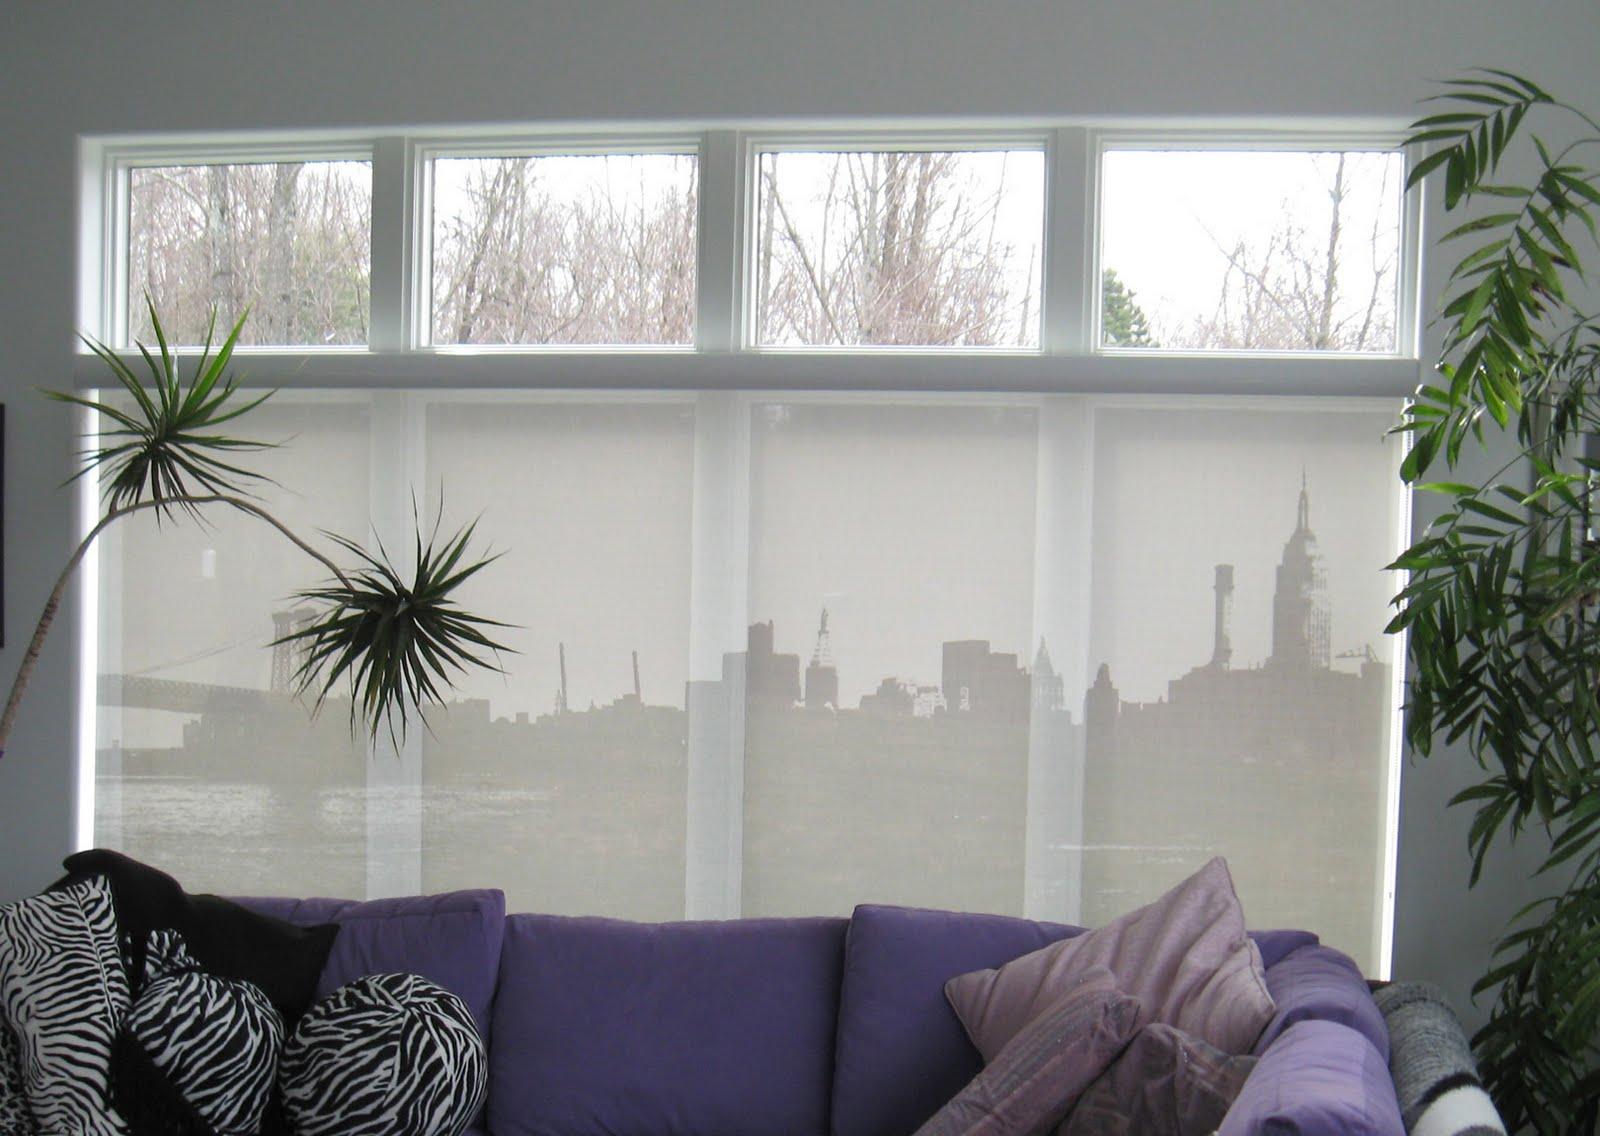 Fantasy shade ikea hackers for Ikea blinds and shades